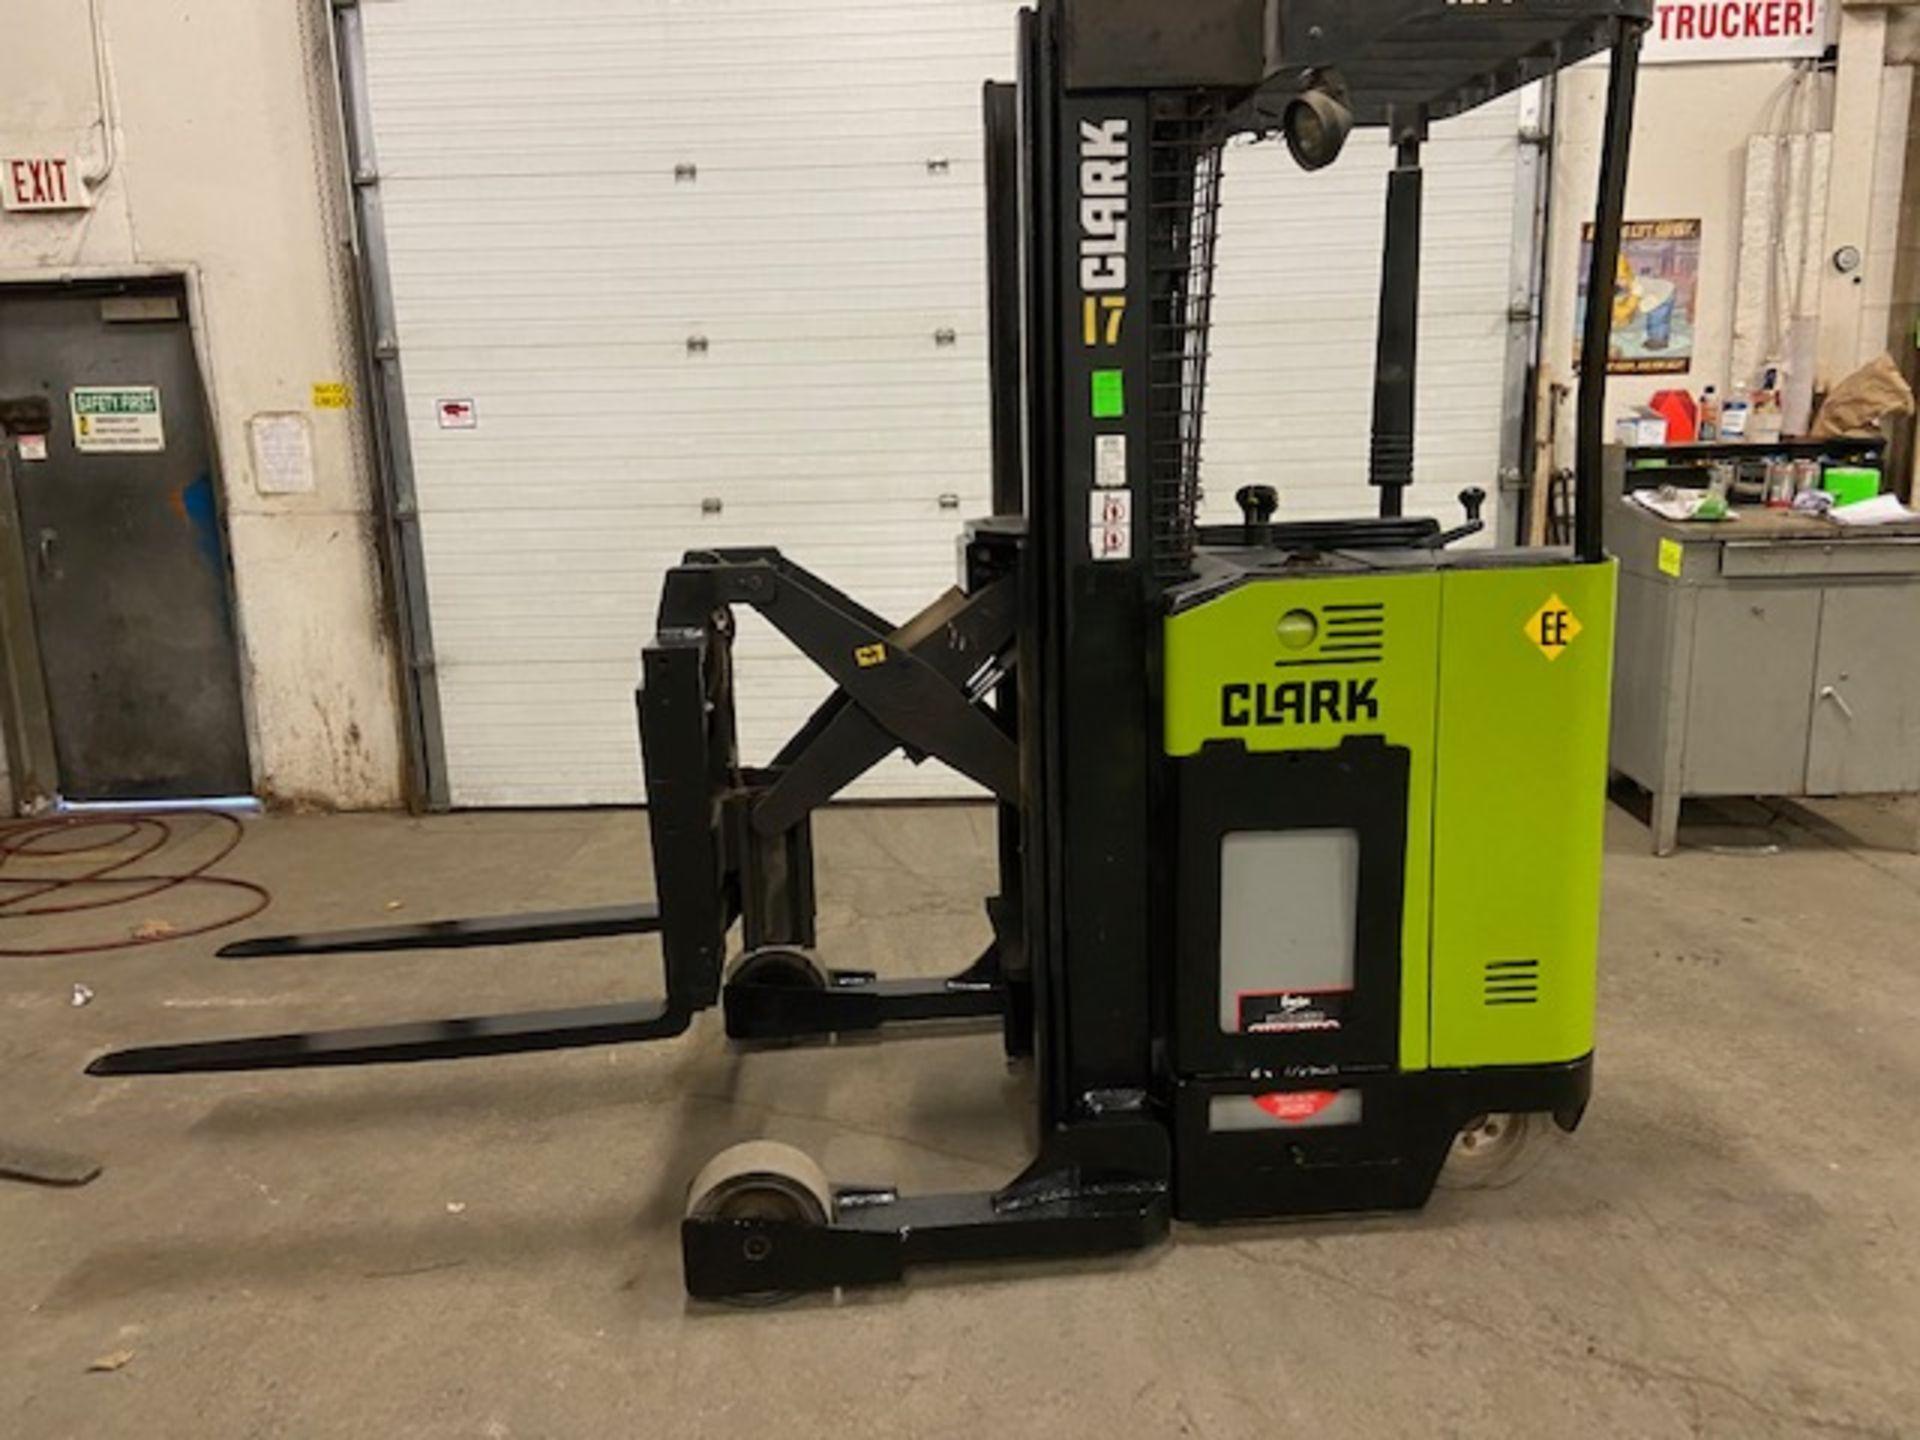 FREE CUSTOMS - Clark Reach Truck EXPLOSION PROOF (EE) Pallet Lifter 3500lbs capacity REACH TRUCK